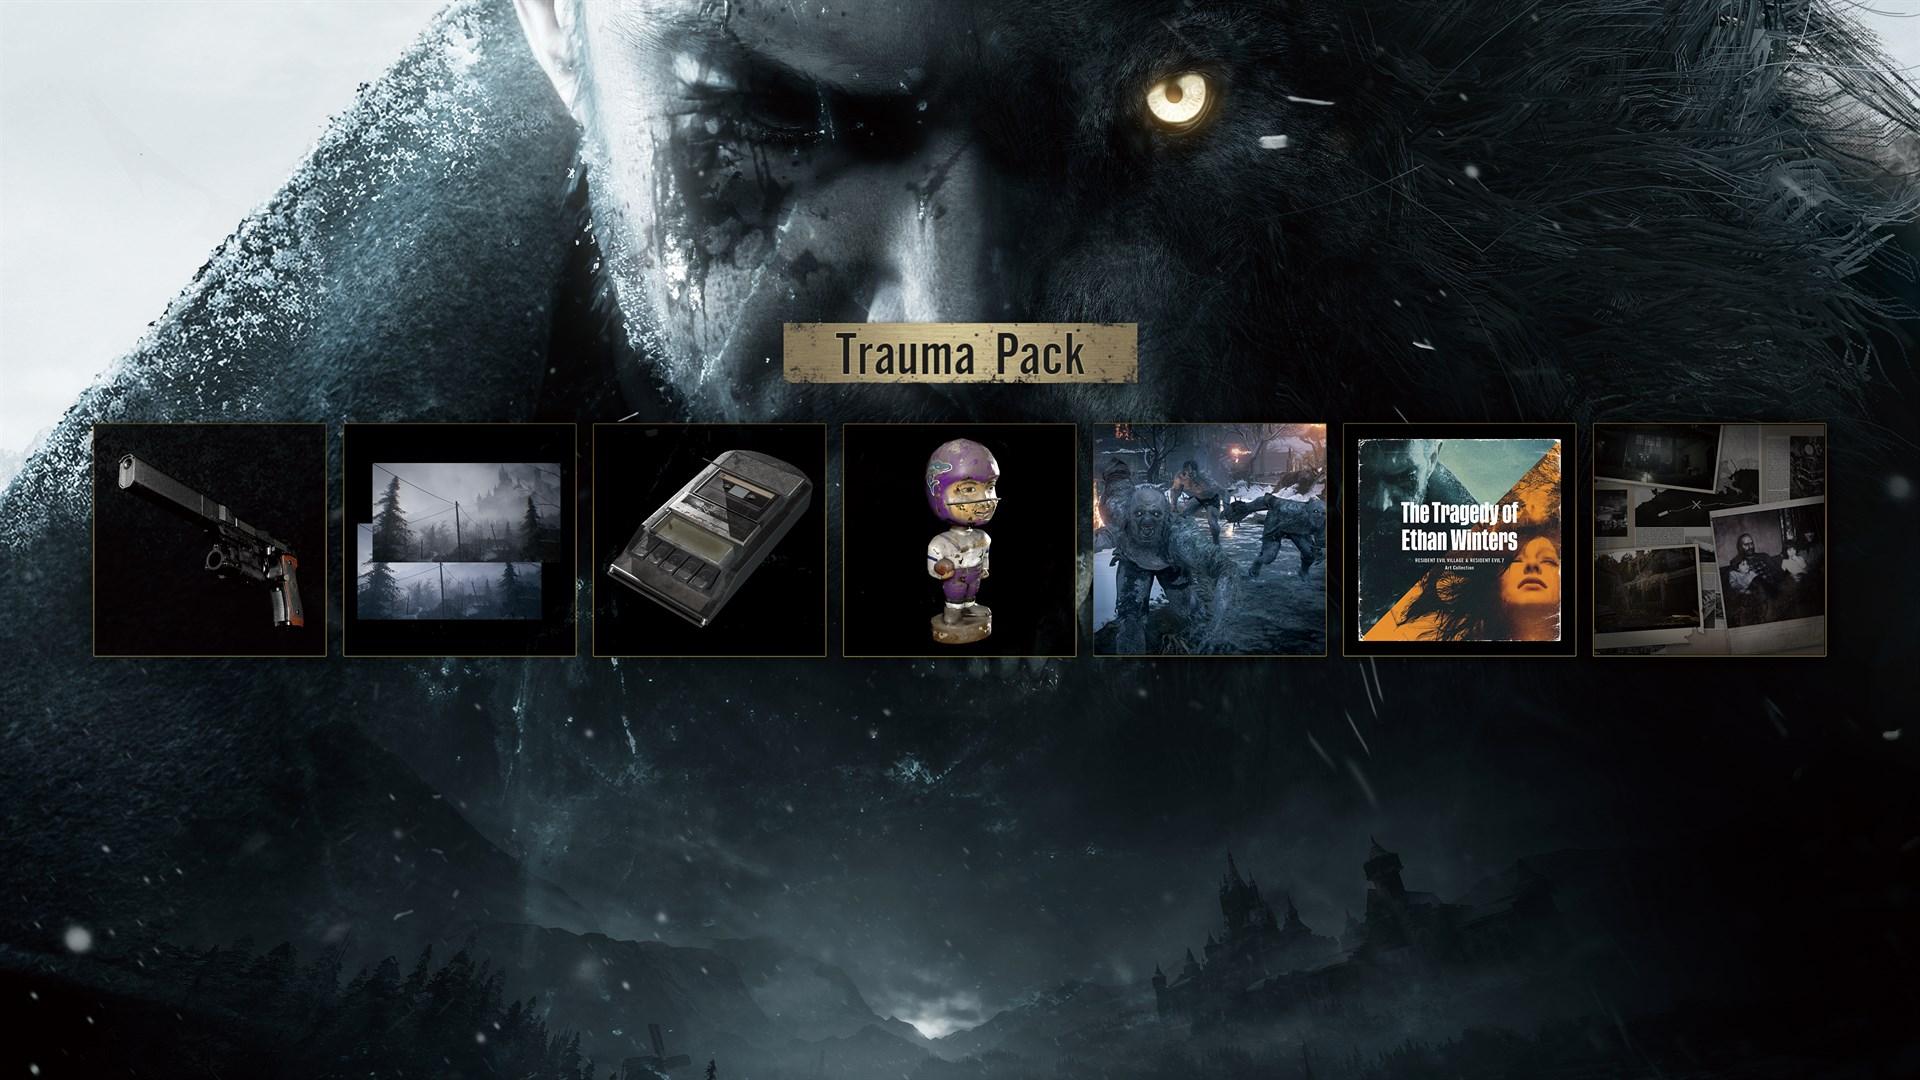 Trauma Pack